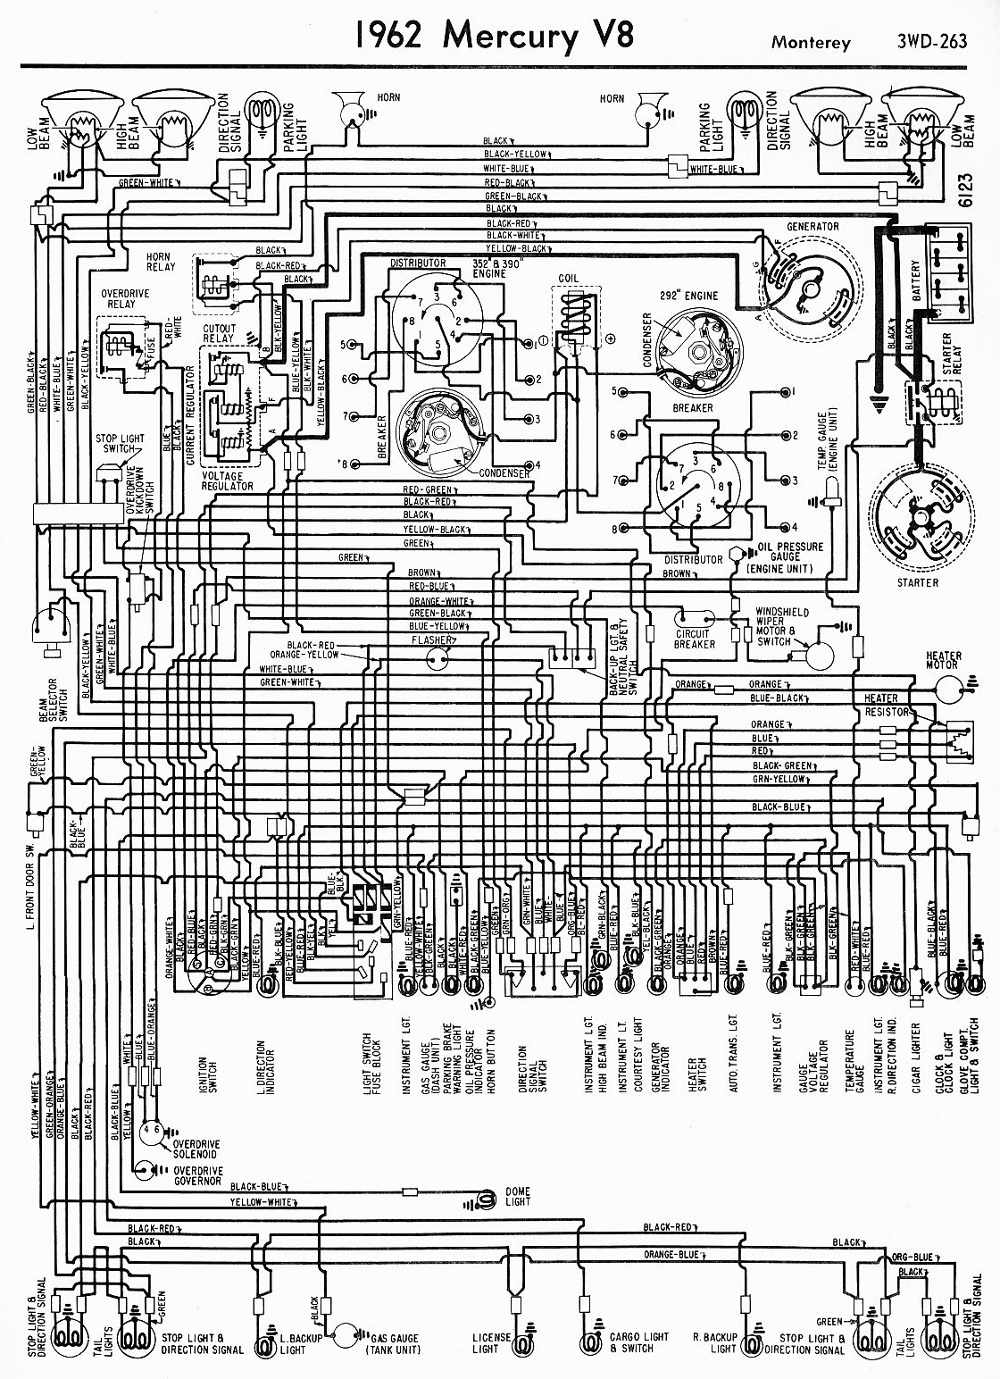 1954 Mercury Monterey Wiring Diagram Schemes Corvette 1956 Electrical Diagrams Pontiac